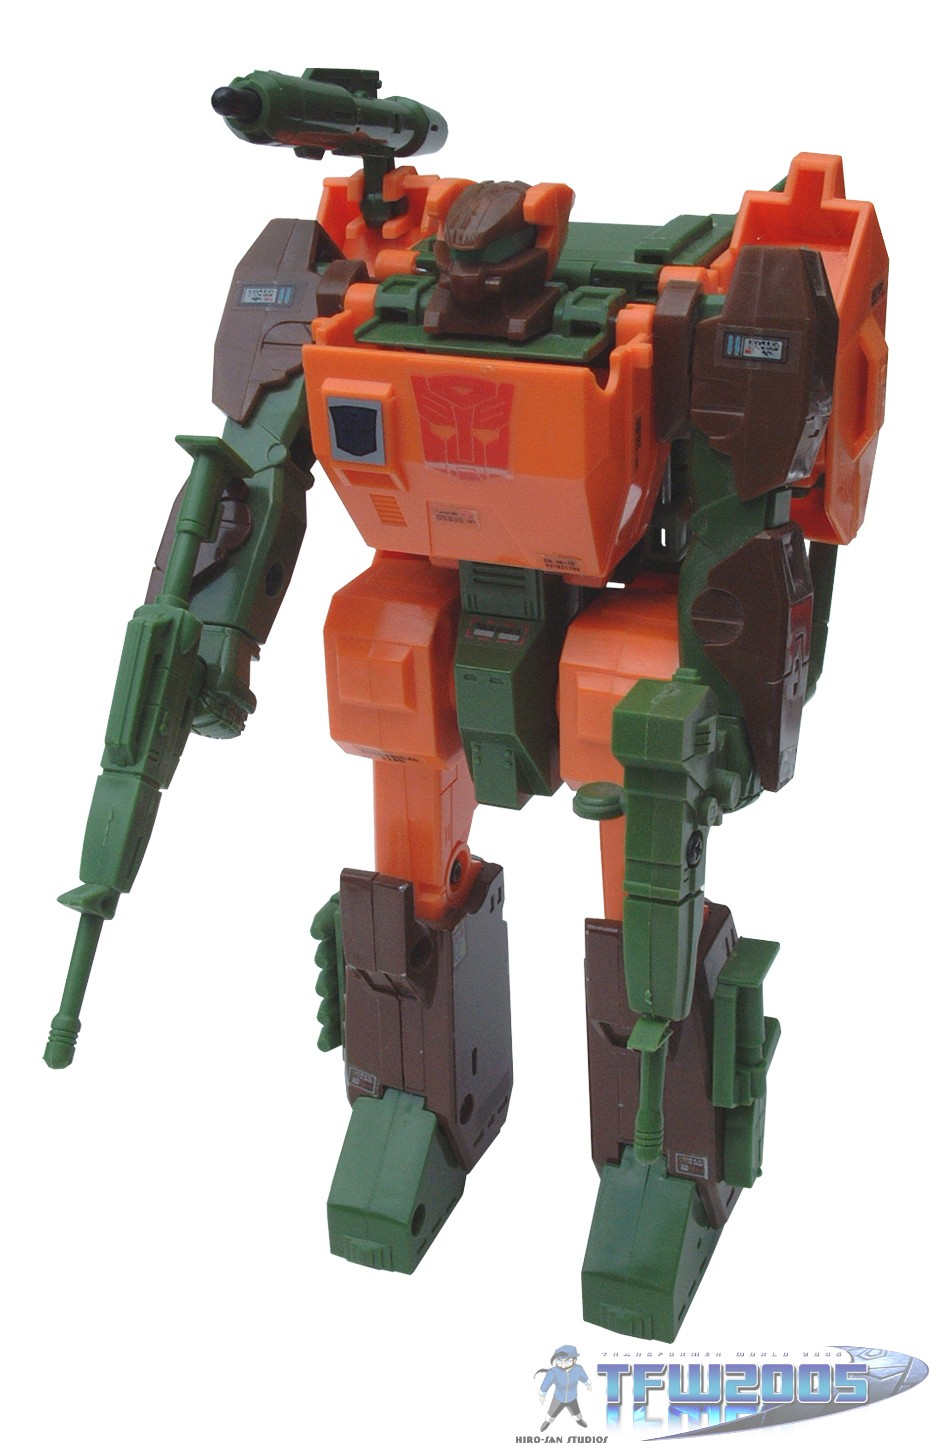 Roadbuster Transformers g1